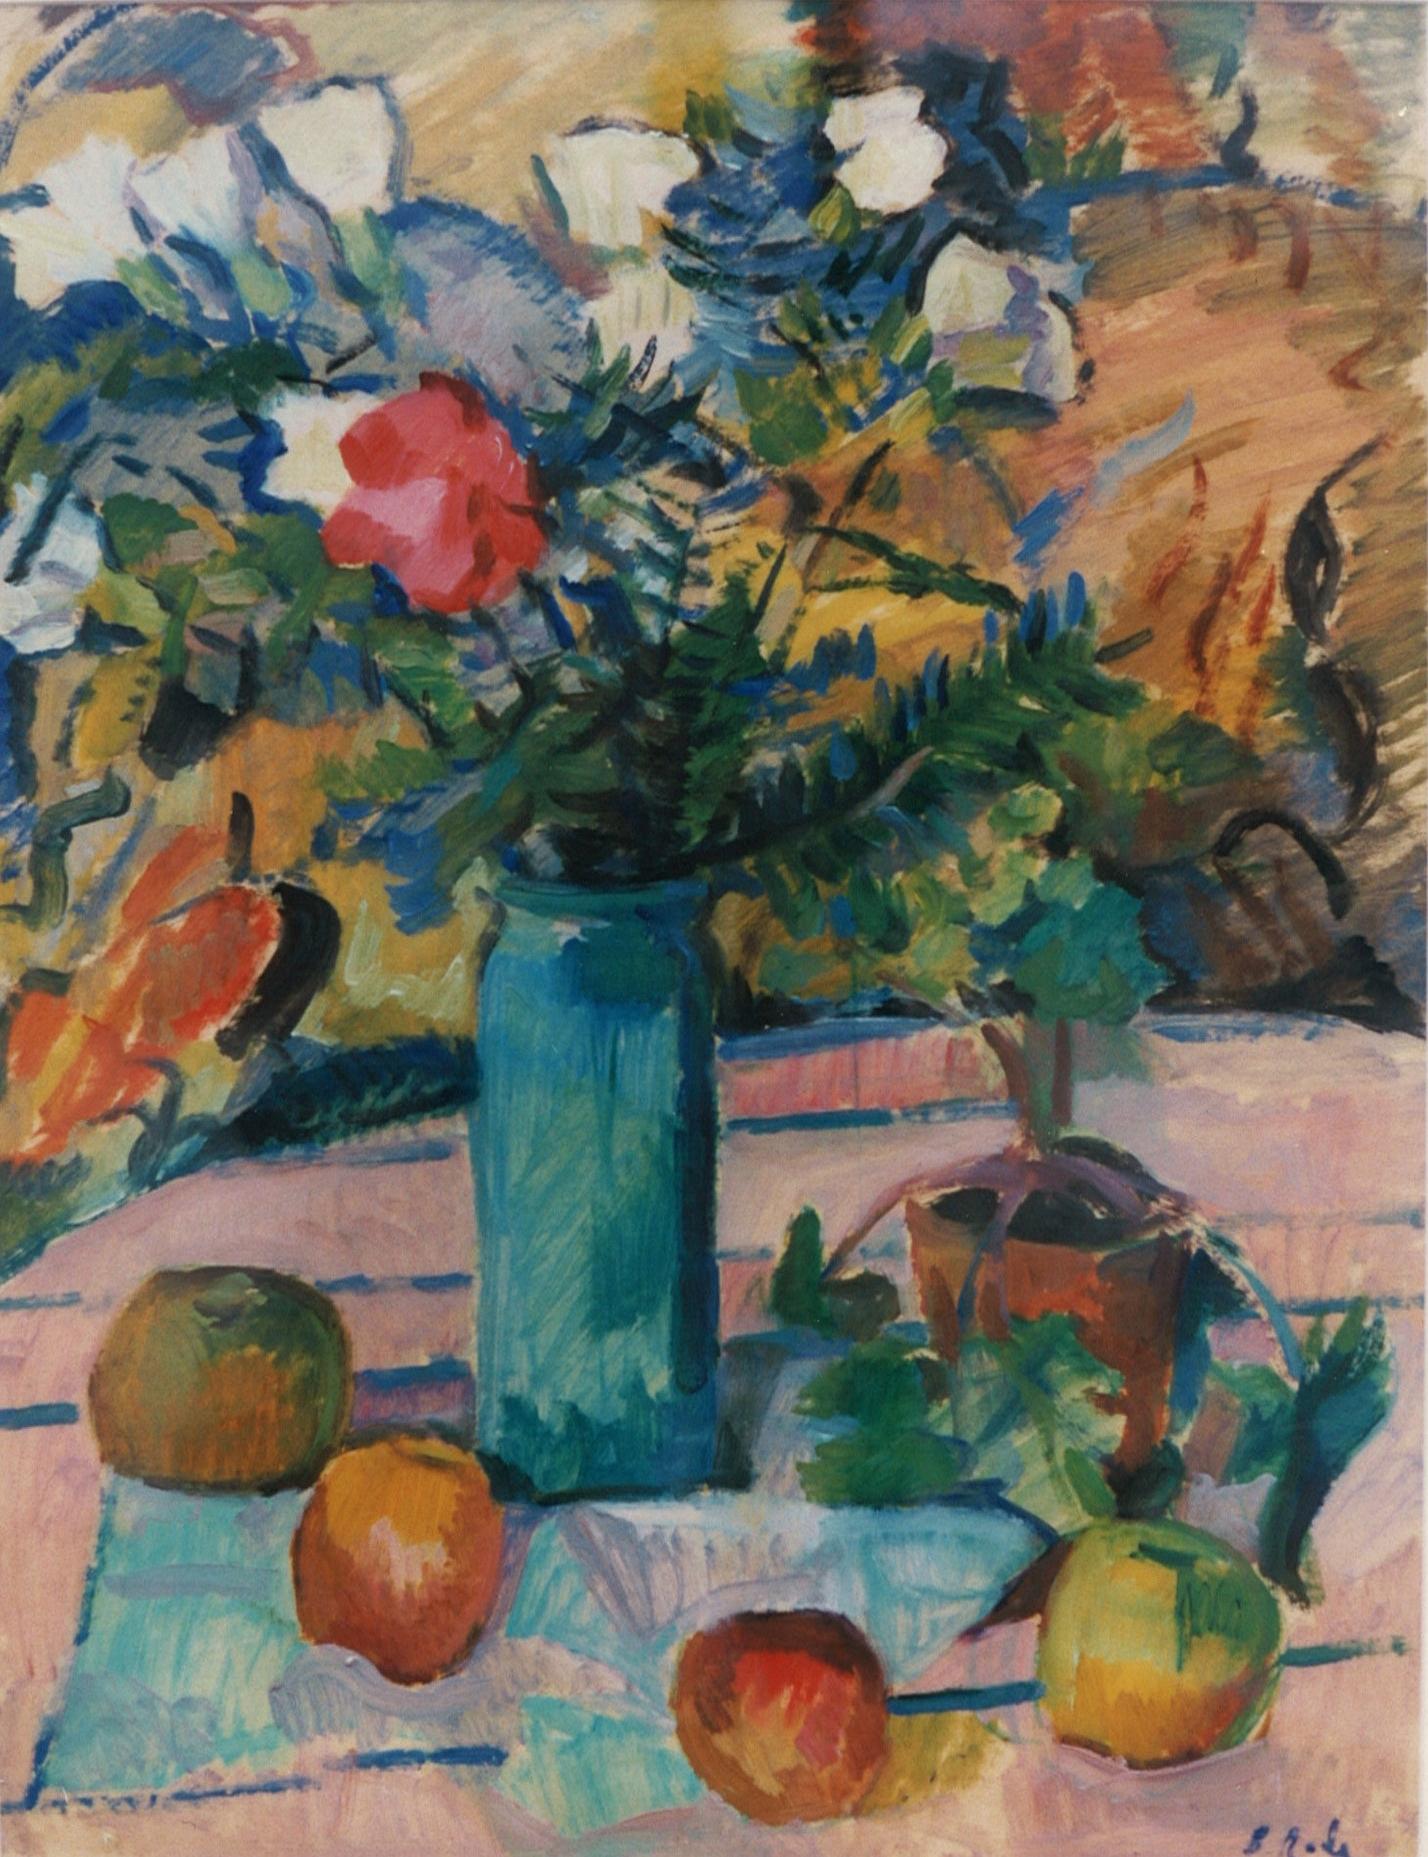 Still Life , Barbara (Zouzouline) Rodé, oil on canvas, 1983.03.01